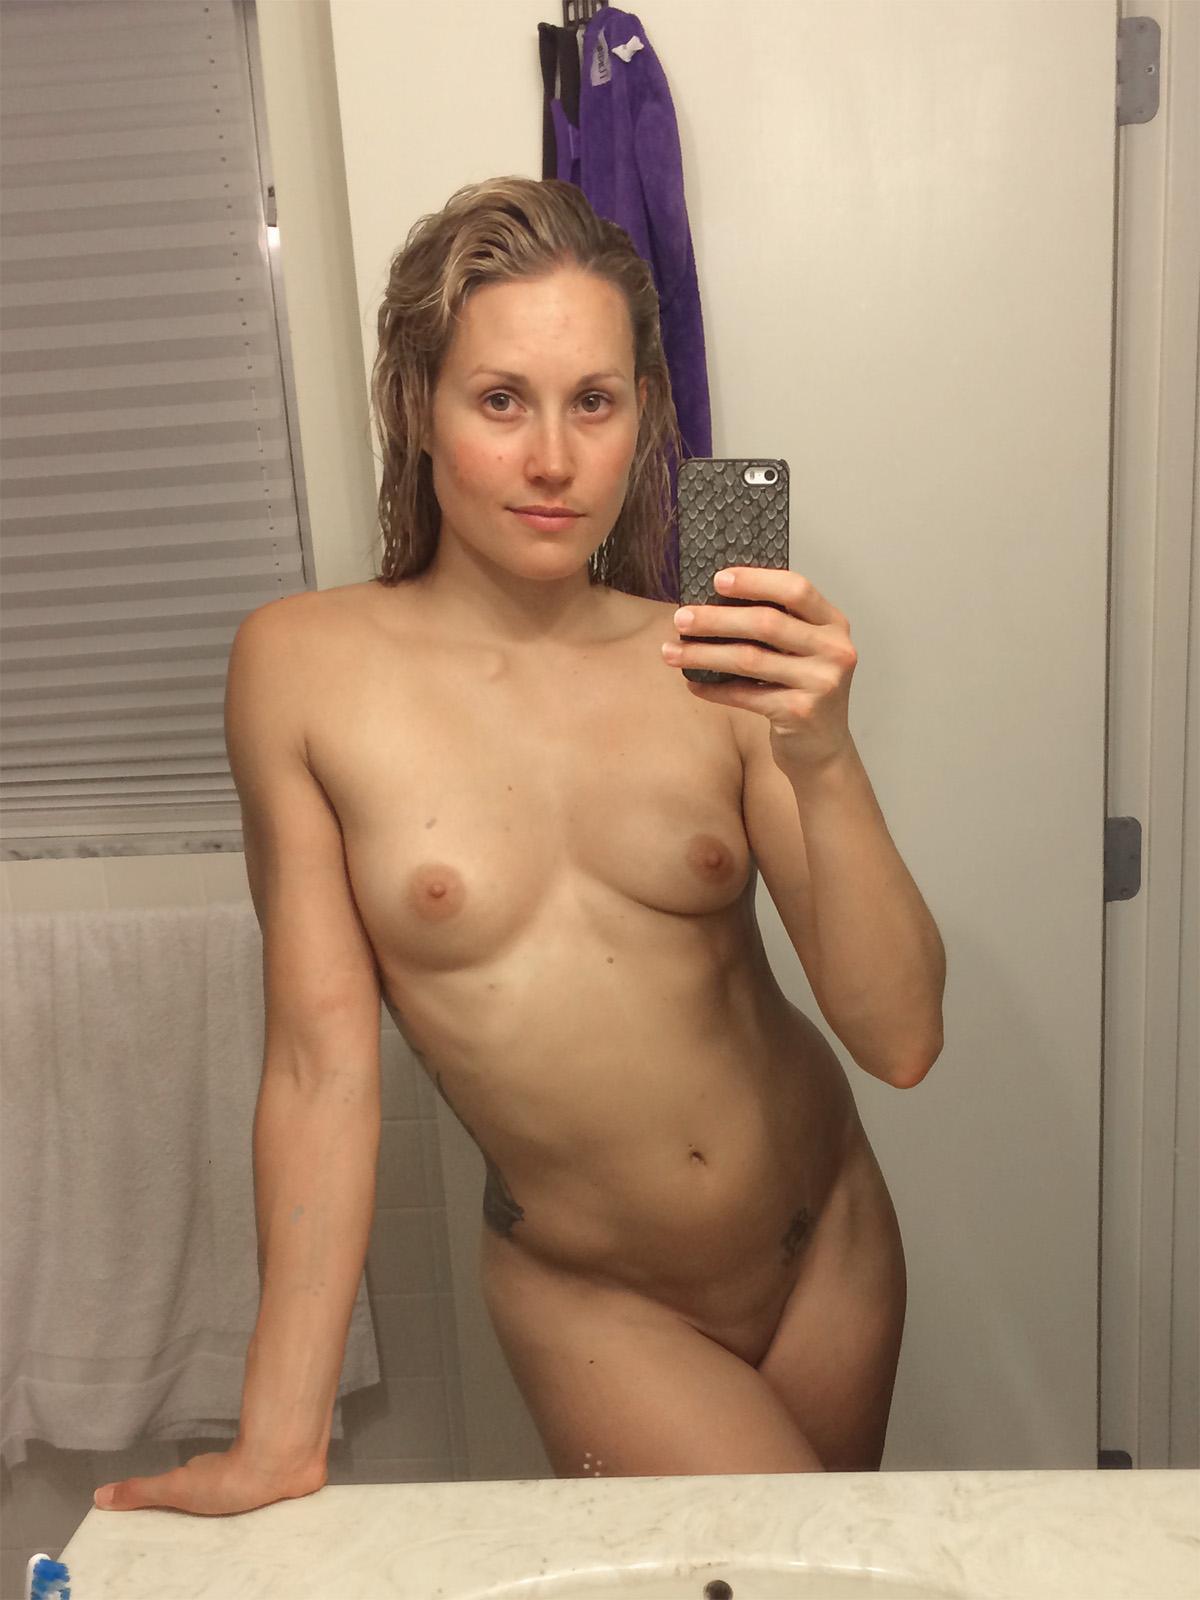 Apologise, nude cheerleaders leaked naked